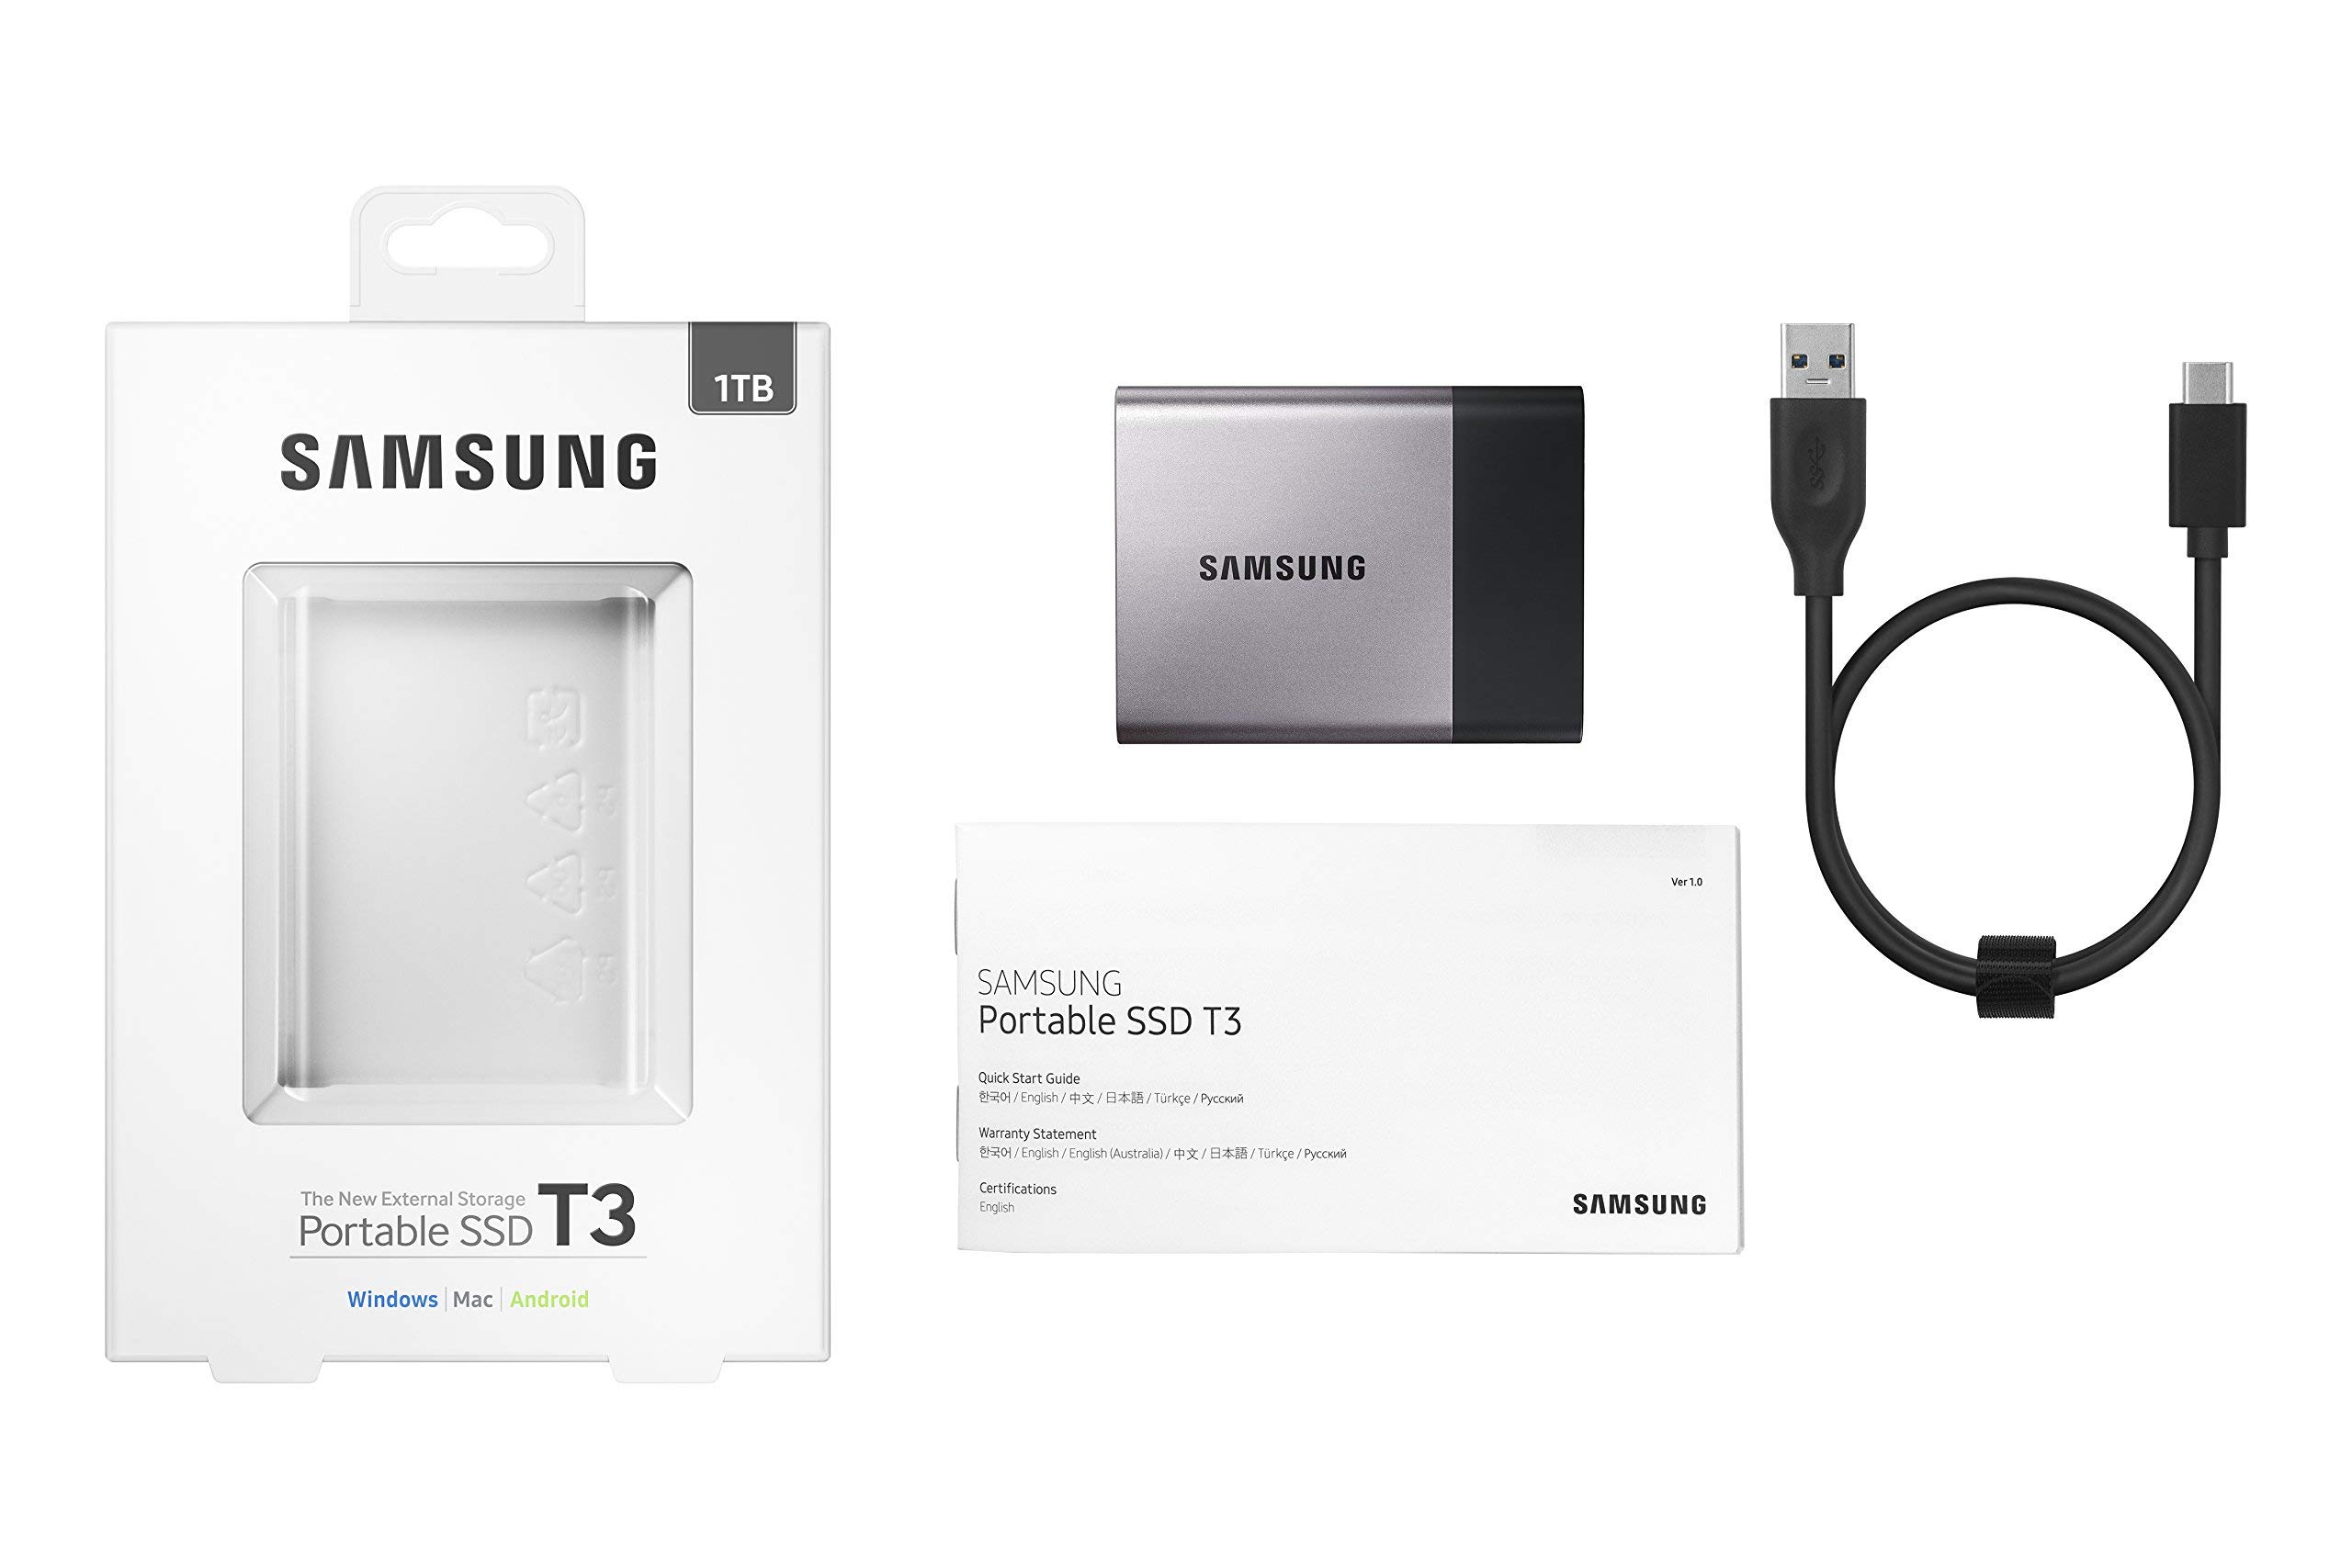 Samsung T3 Portable SSD - 1TB - USB 3.1 External SSD (MU-PT1T0B/AM) (Renewed) by Samsung (Image #5)